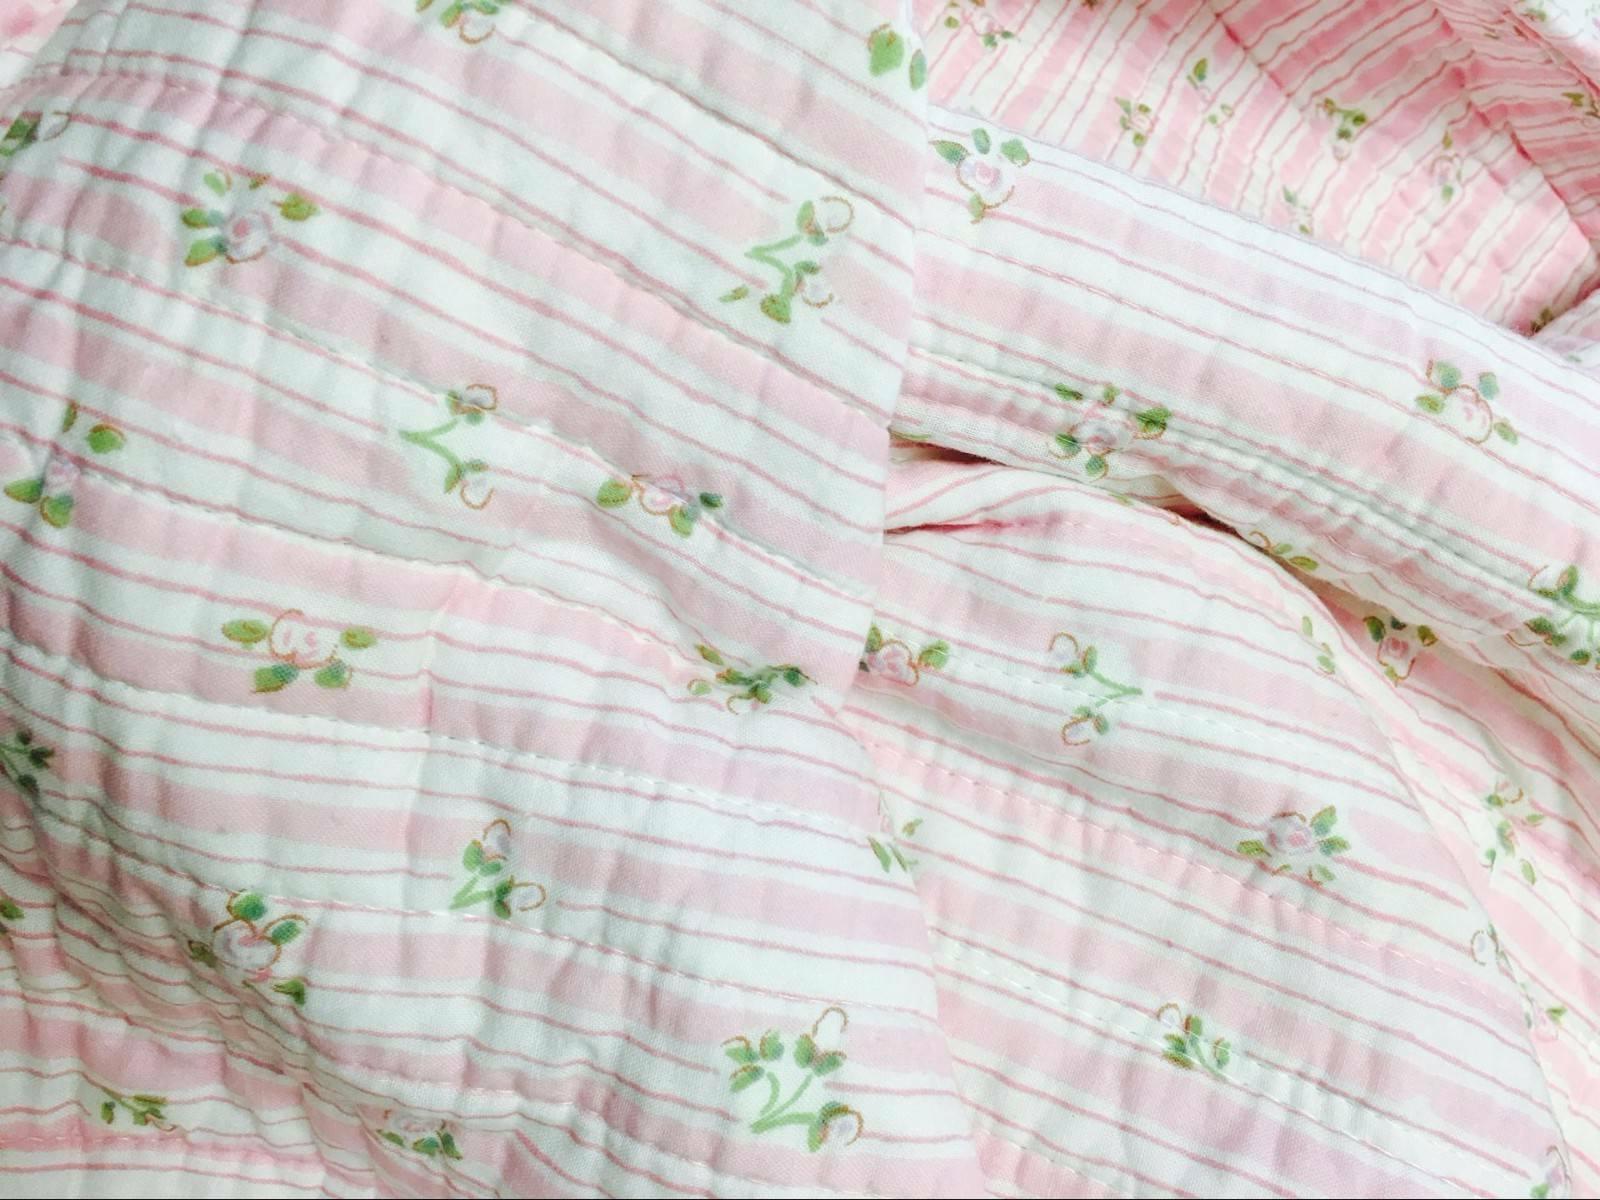 Pink Lace Cotton Set, Bedspread, Coverlet